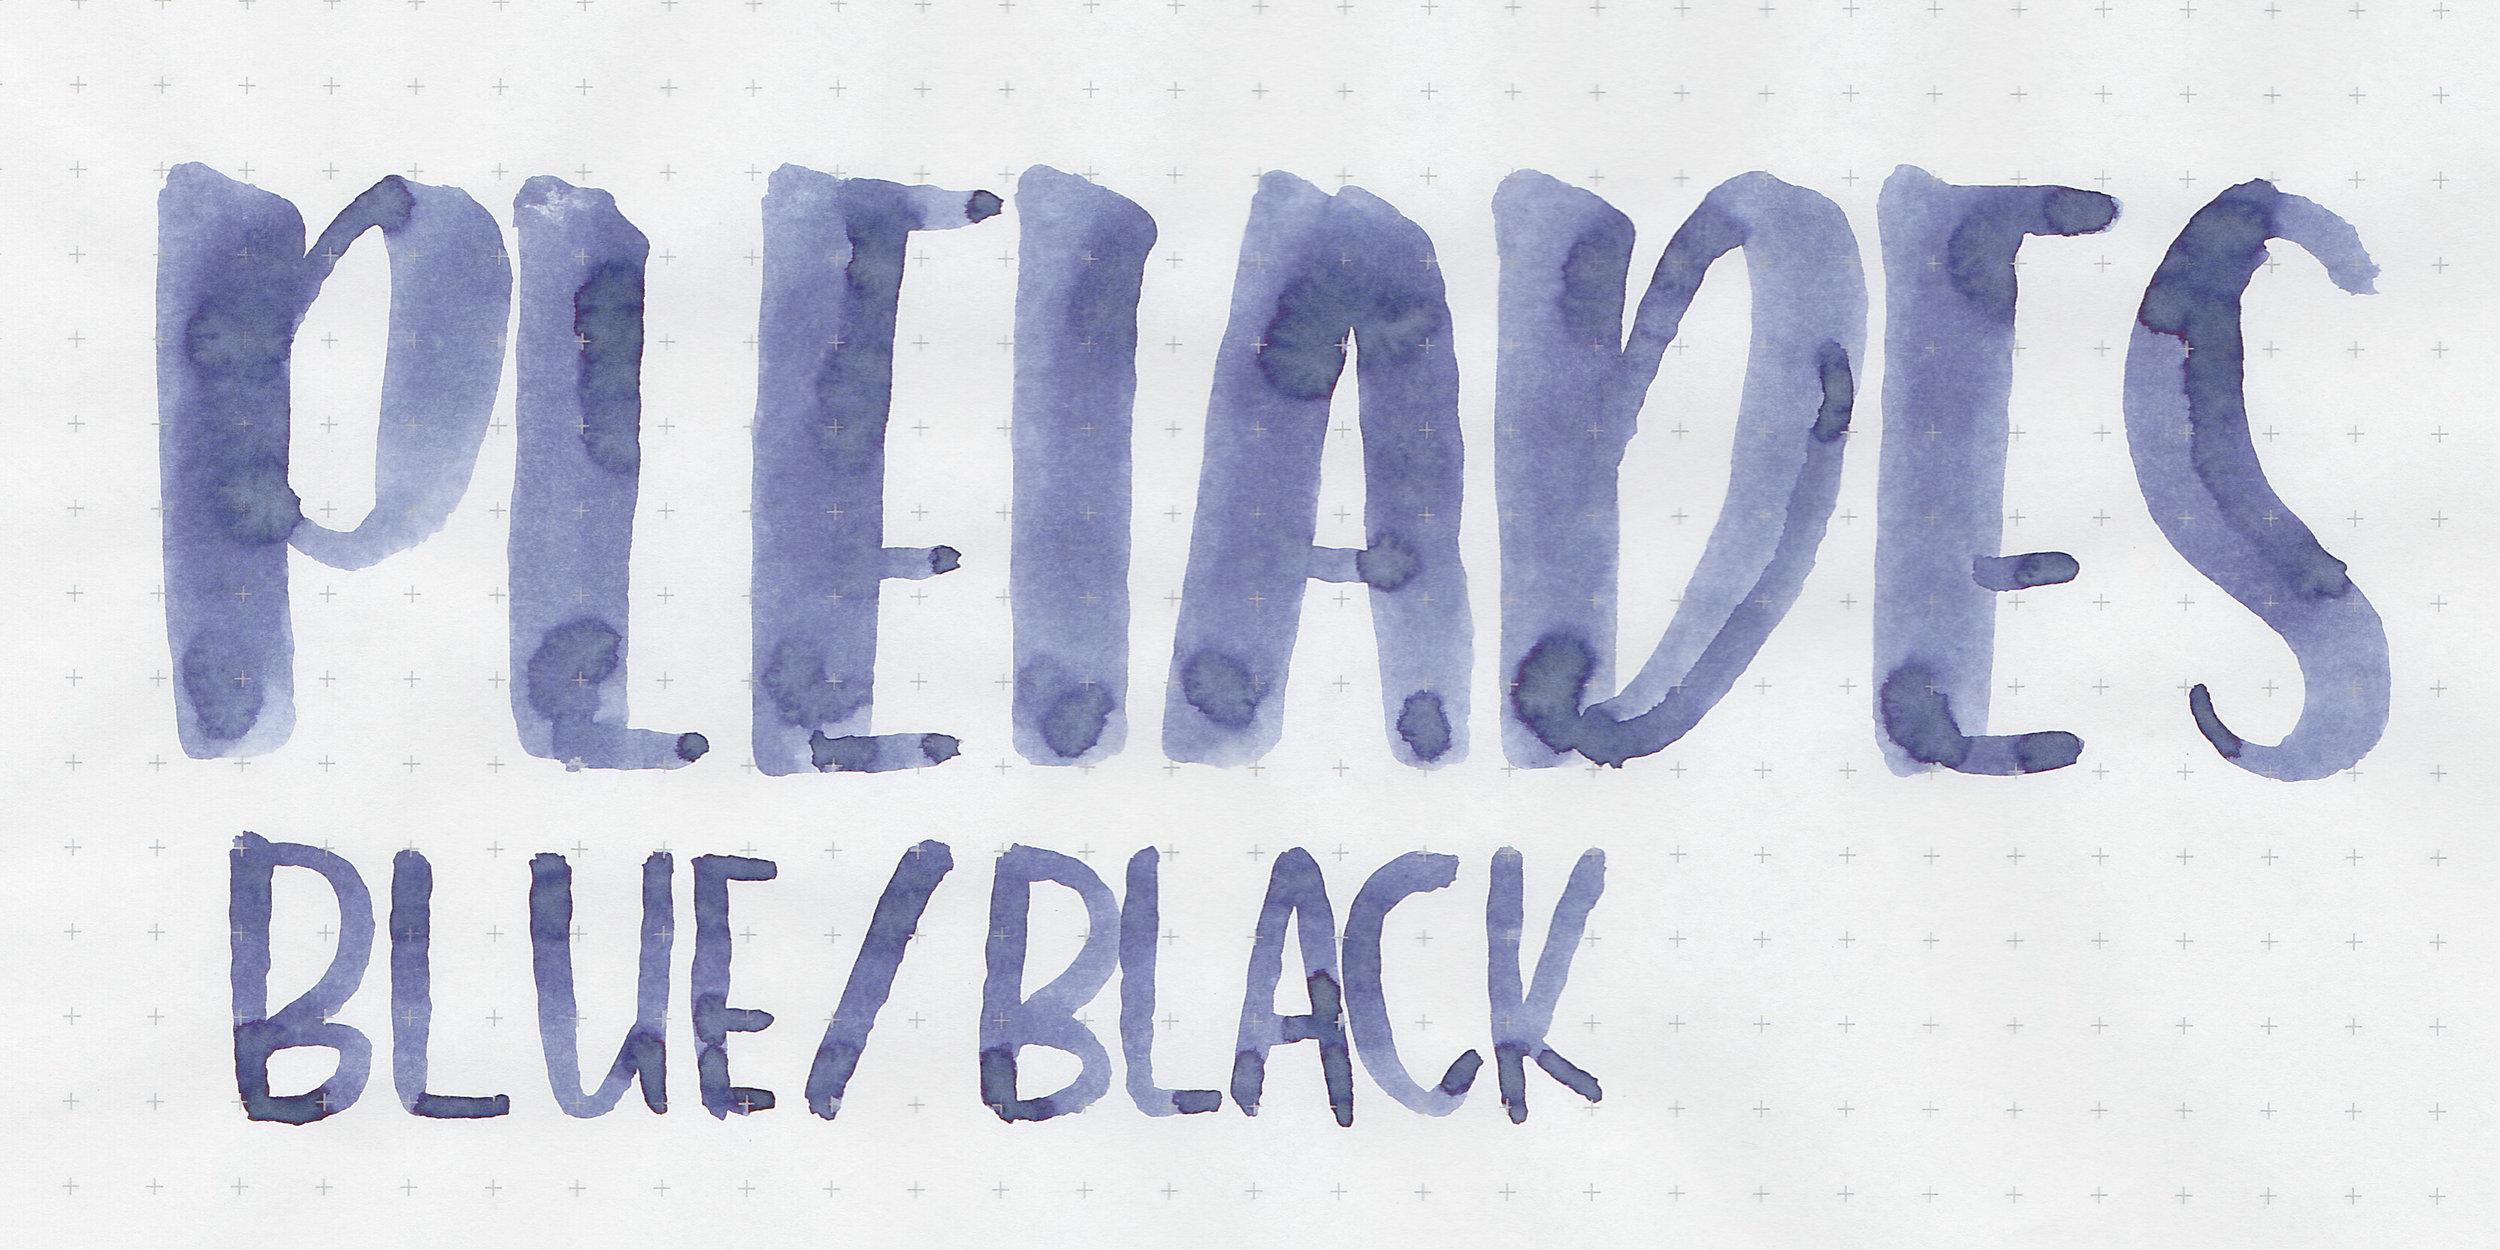 nemo-pleiades-blue-black-2.jpg